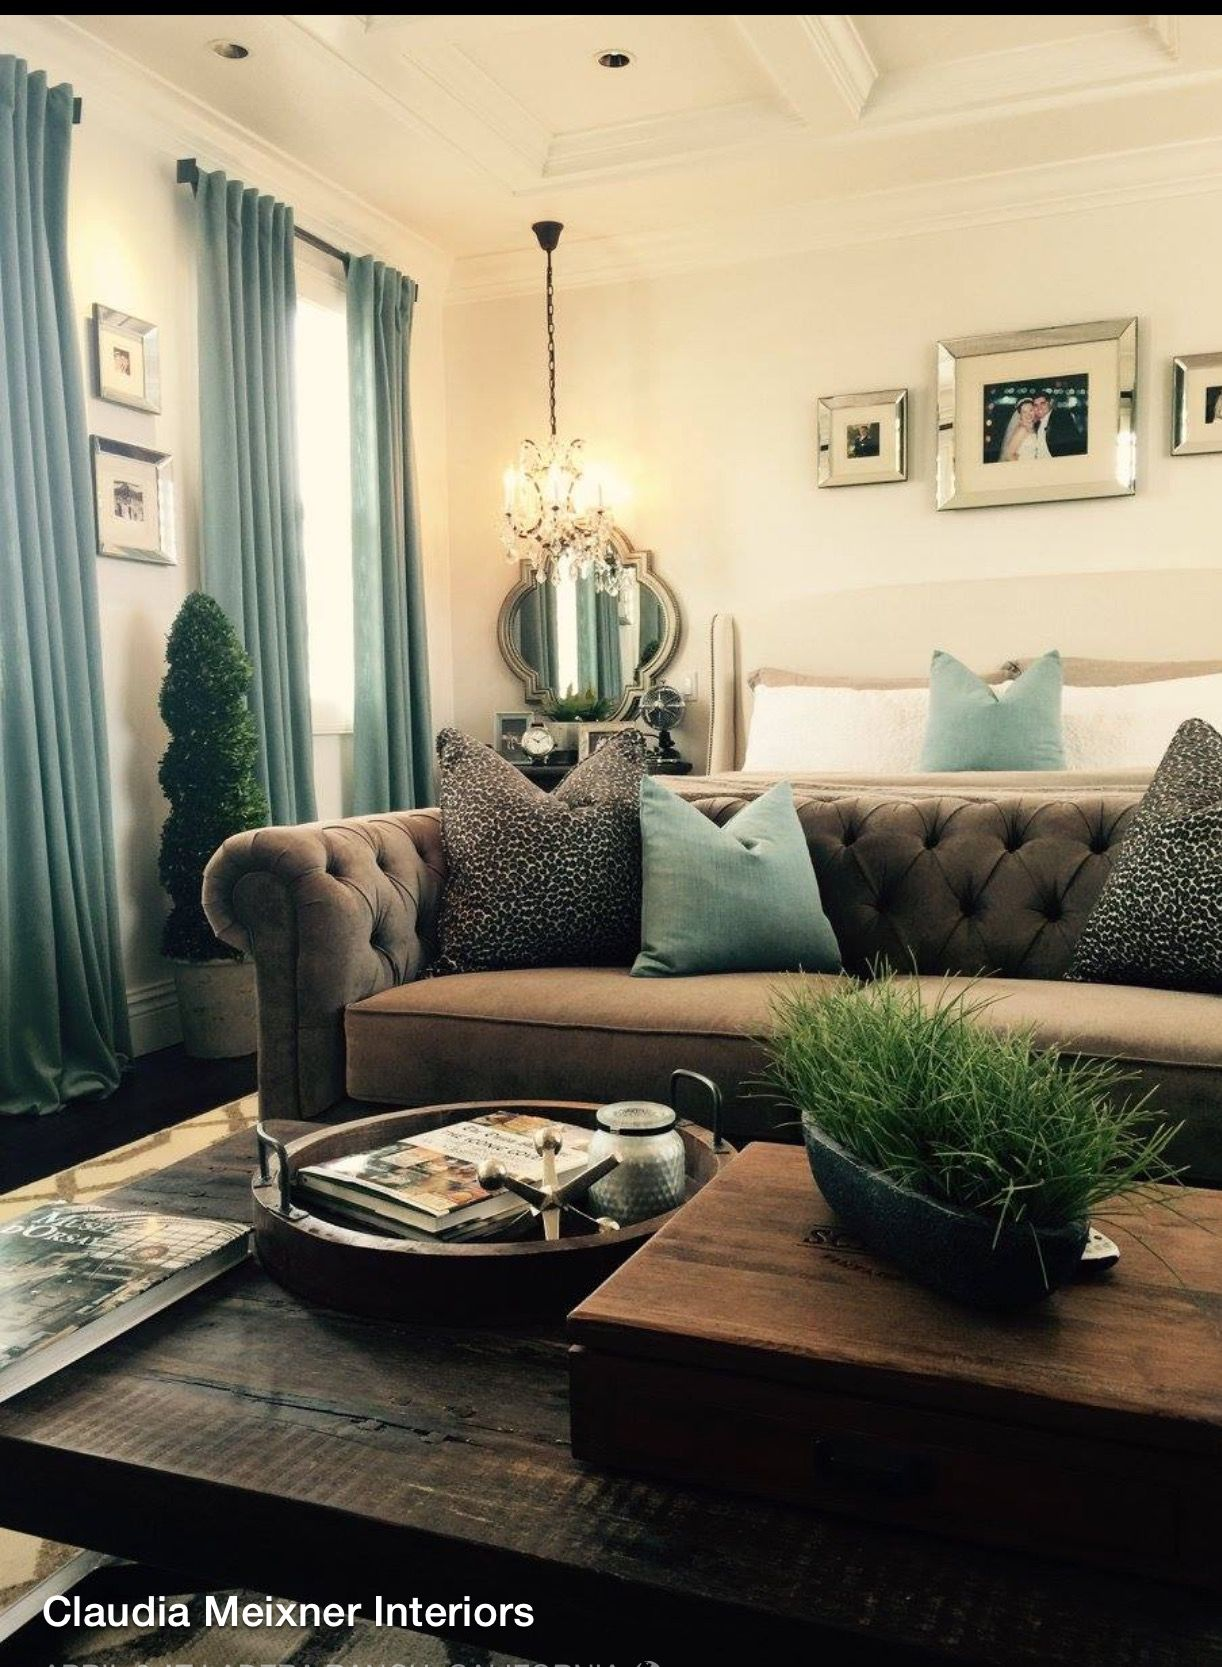 Pin by Claudia Meixner on Claudia Meixner Interiors Home